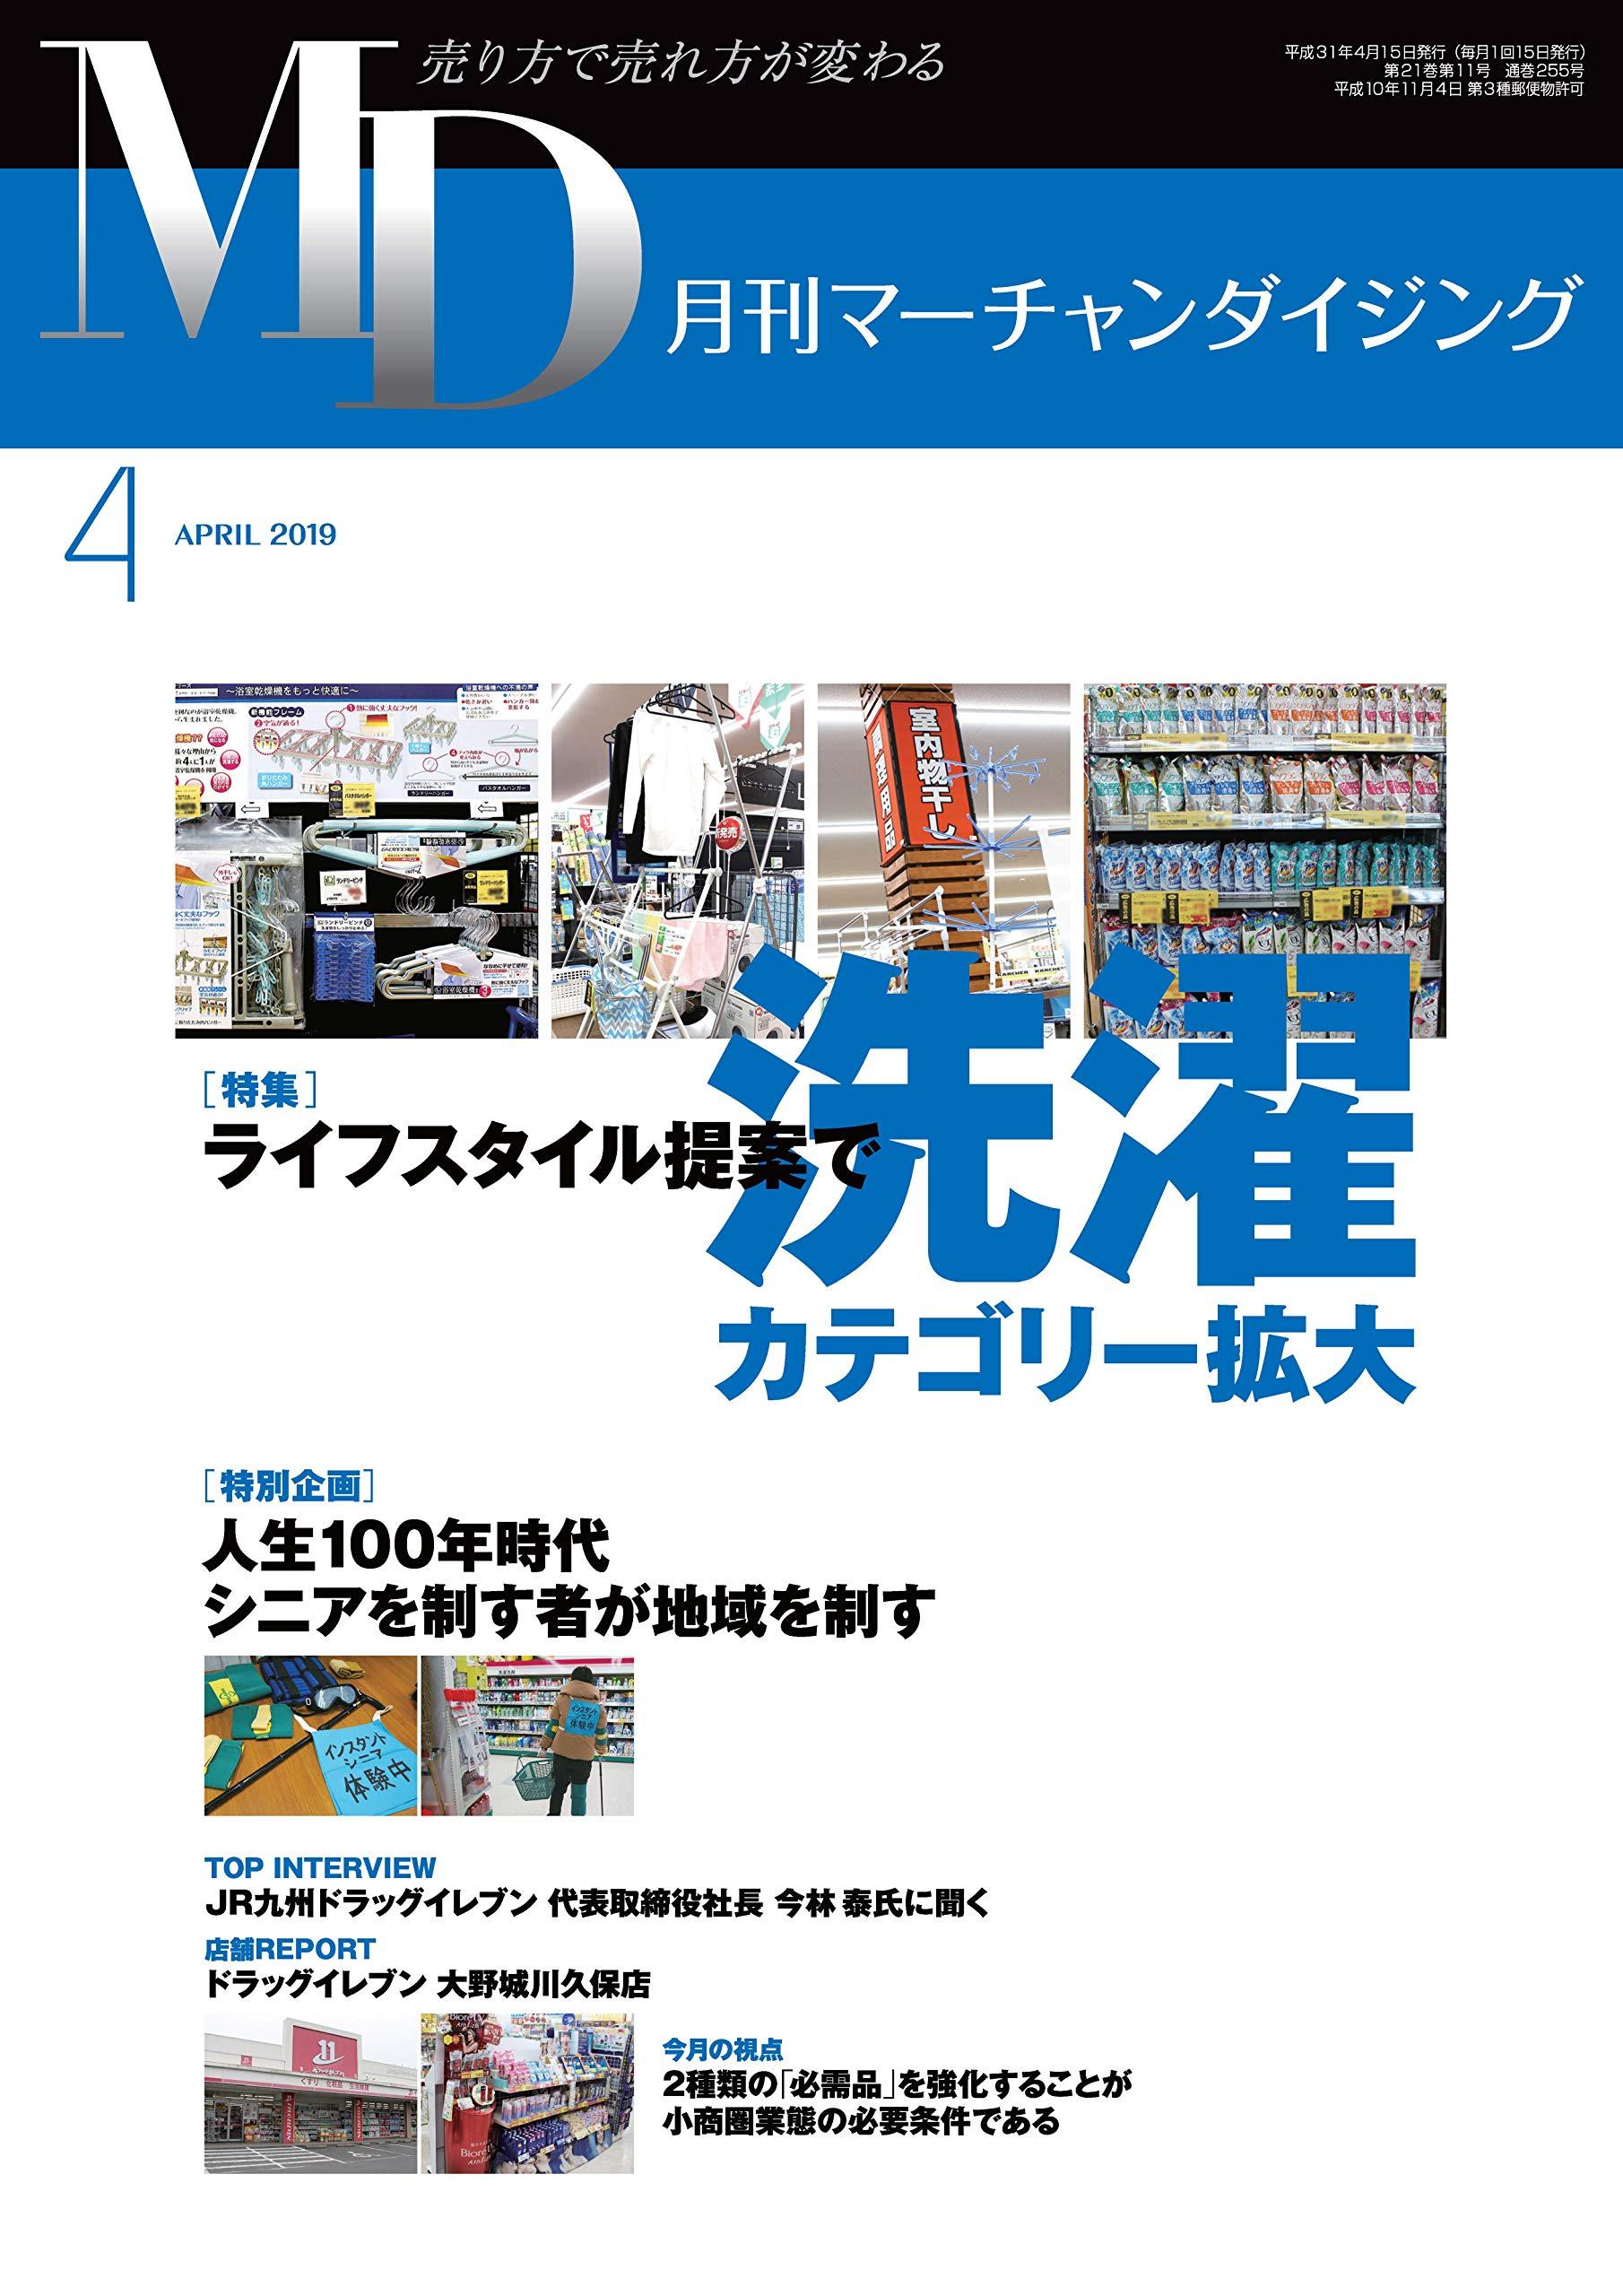 gekkanmahchandaijingunisenjukyunen shigatsugo (Japanese Edition)